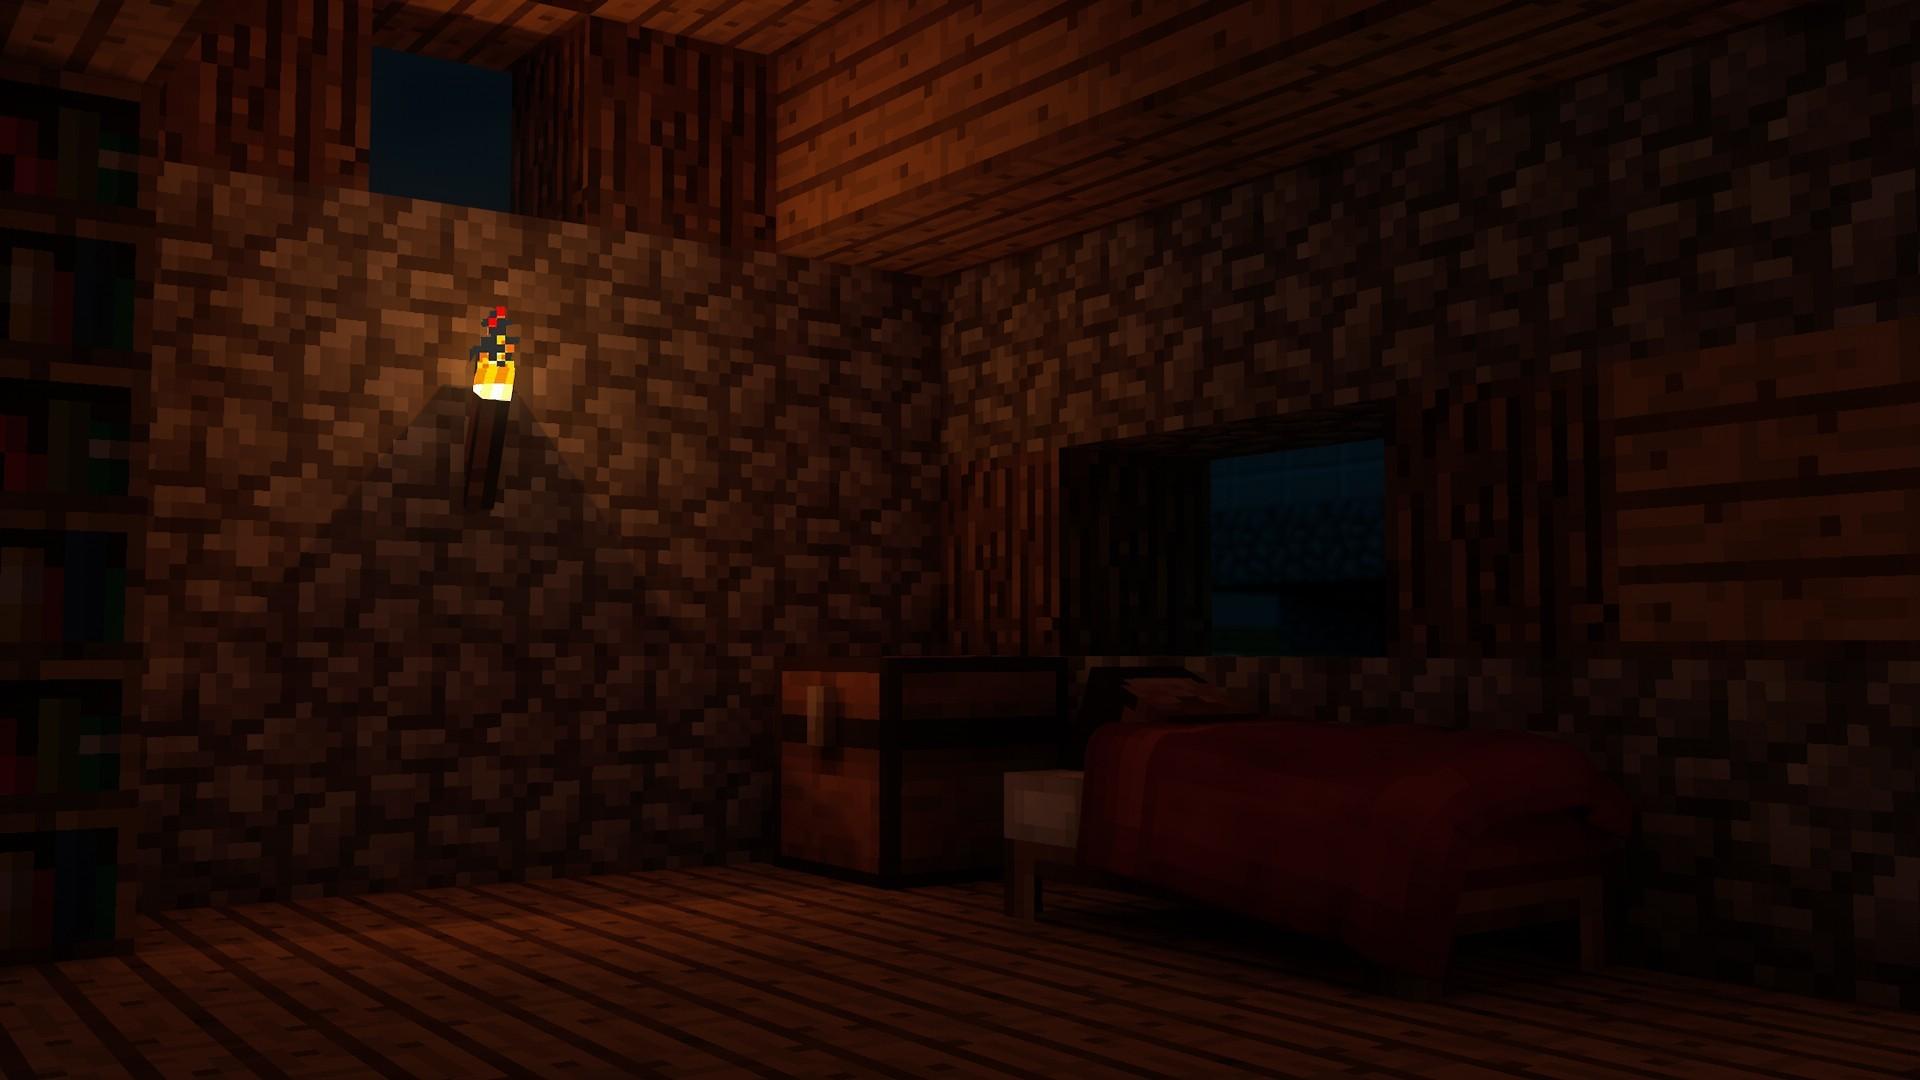 . Wallpaper   video games  night  room  bed  sleeping  house